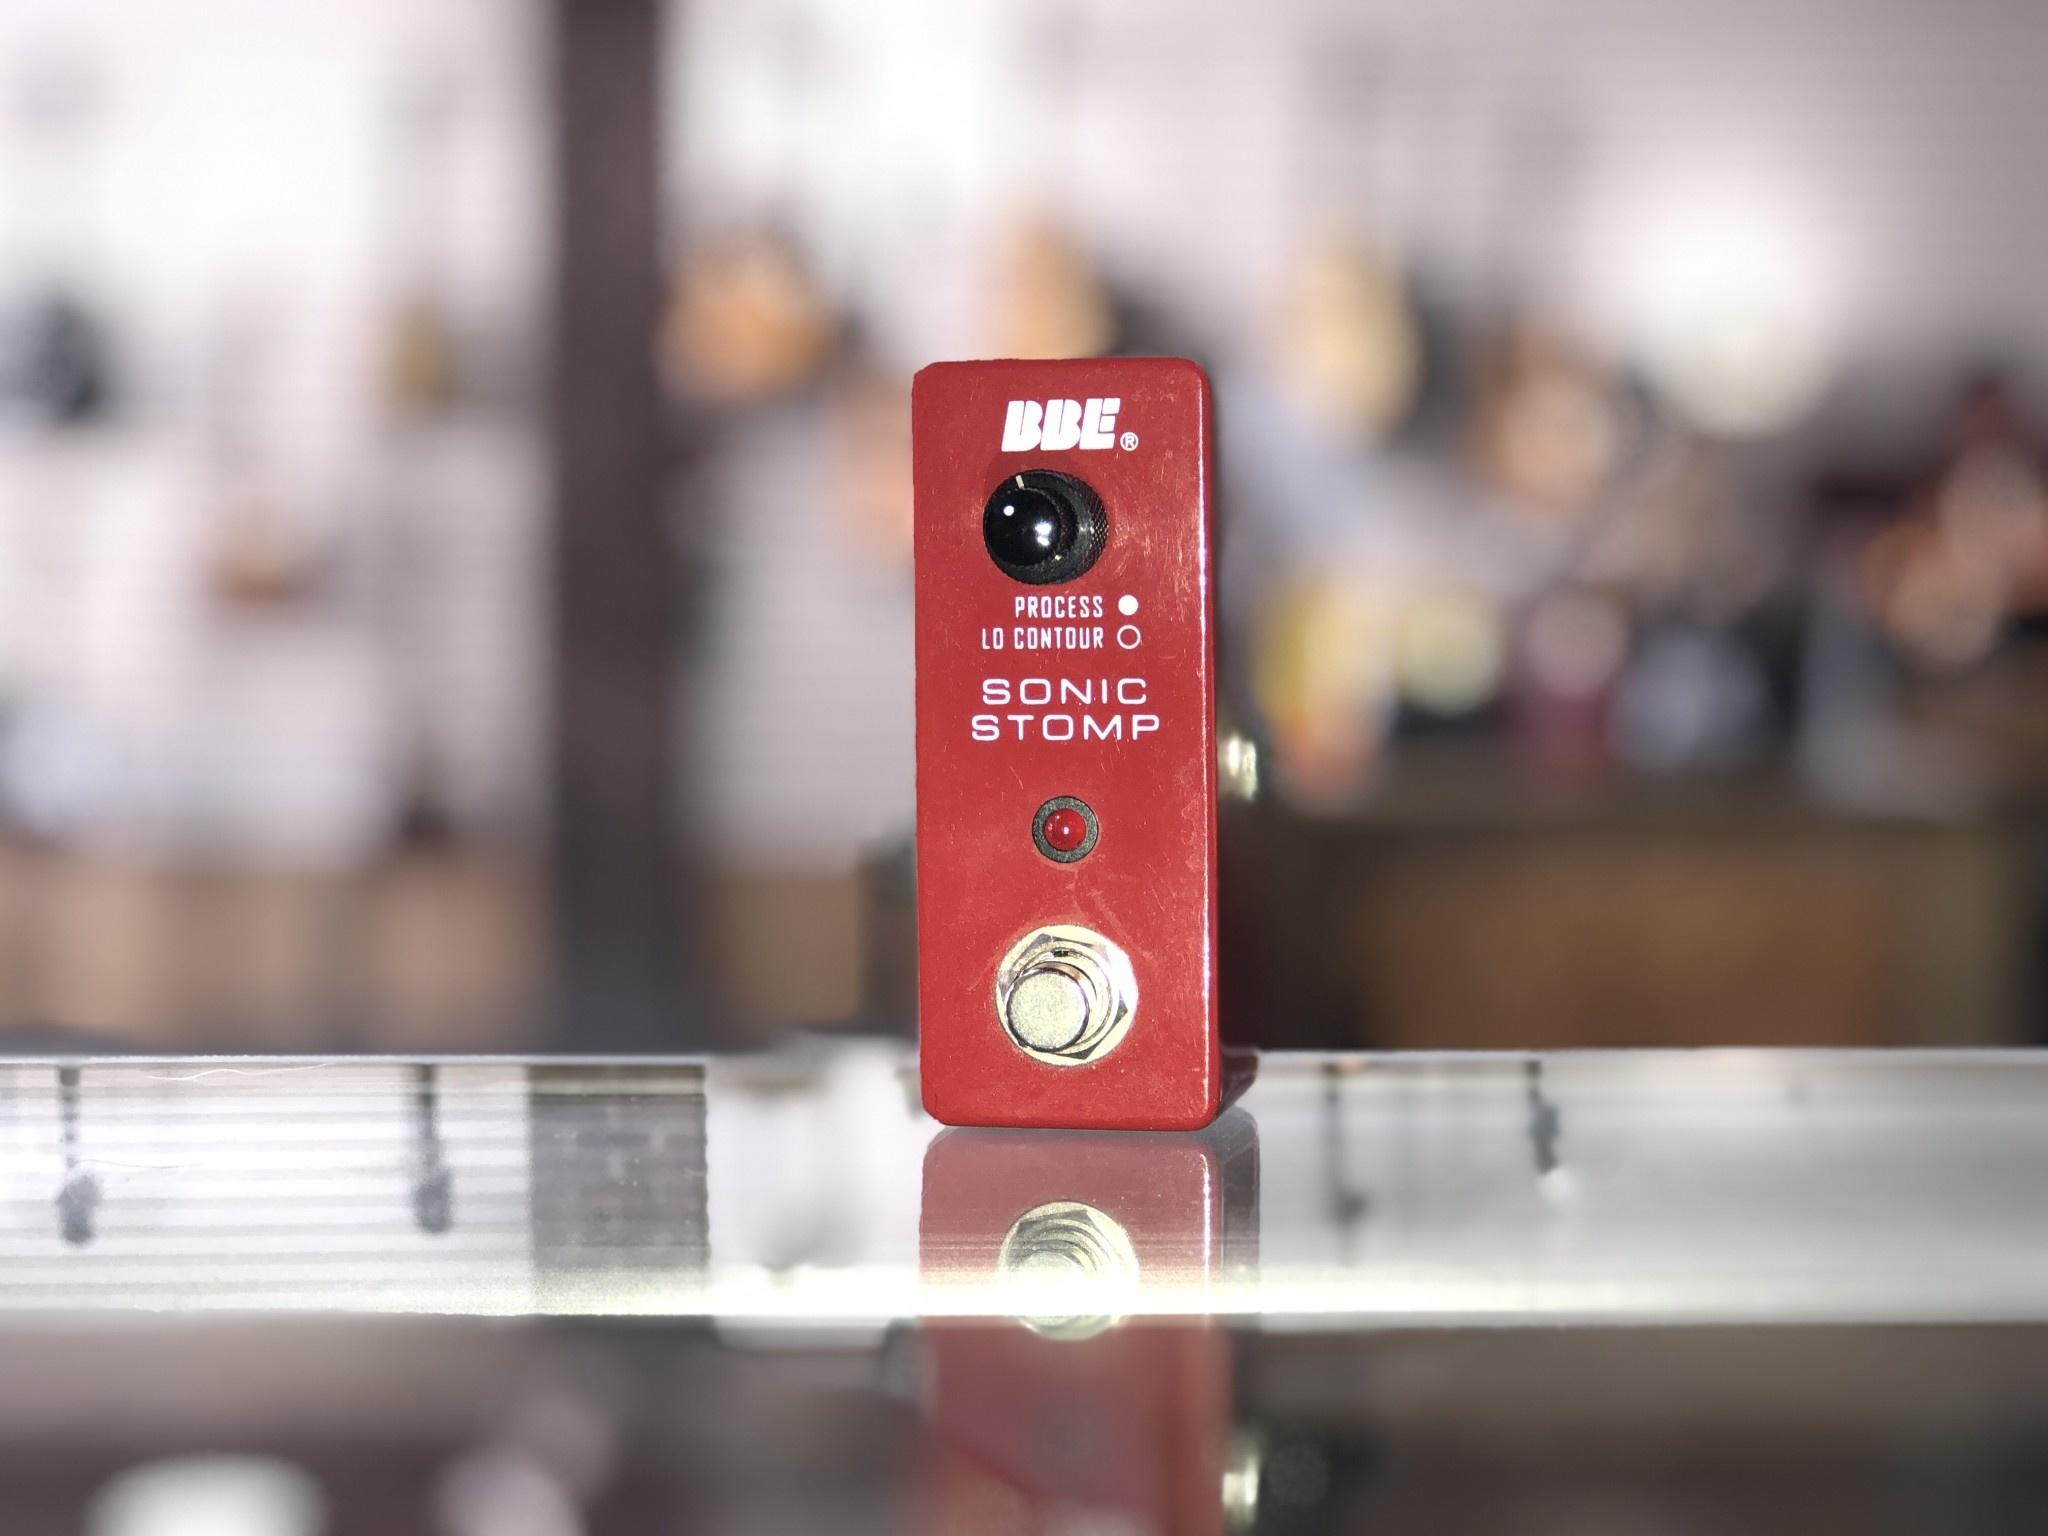 BBE Sonic Stomp Mini-2